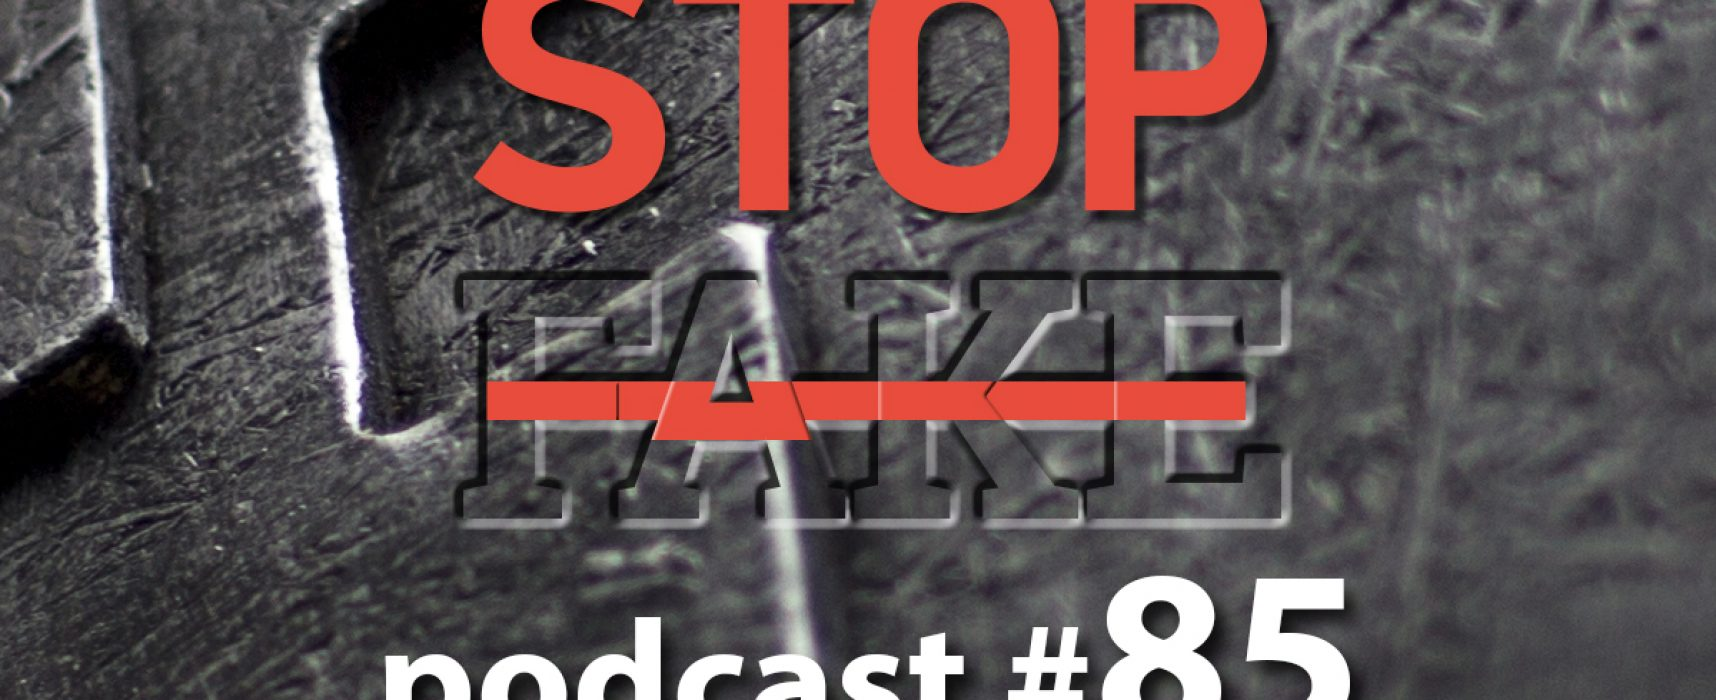 StopFake podcast #85